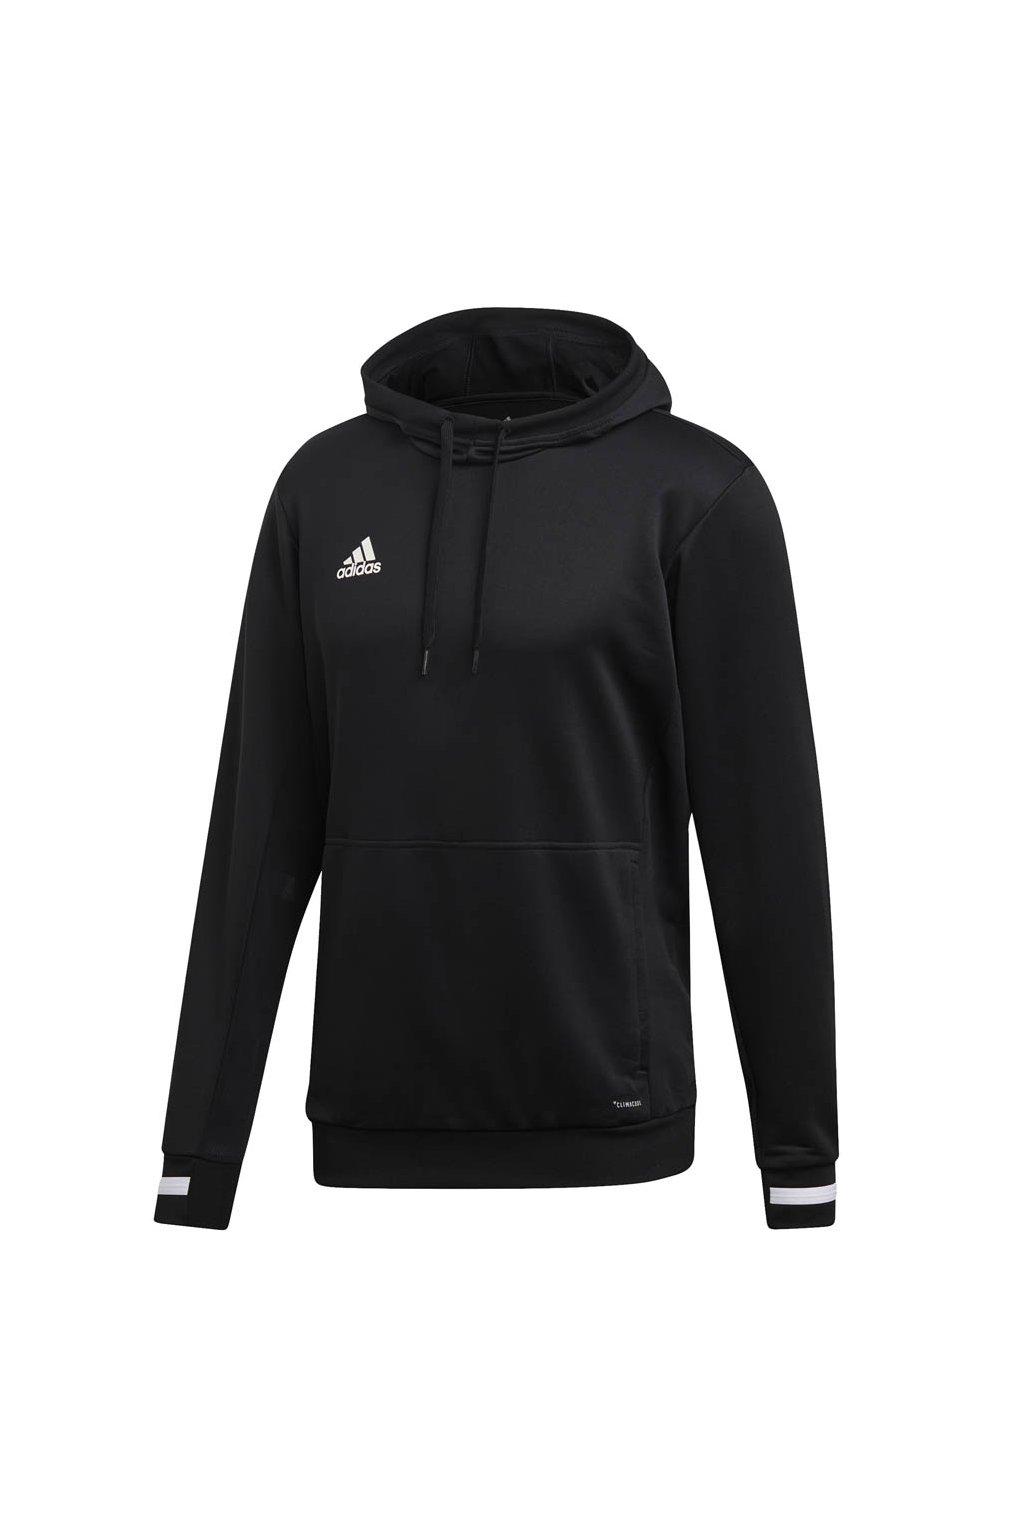 Pánska mikina Adidas Team 19 Hoody M, čierna DW6860